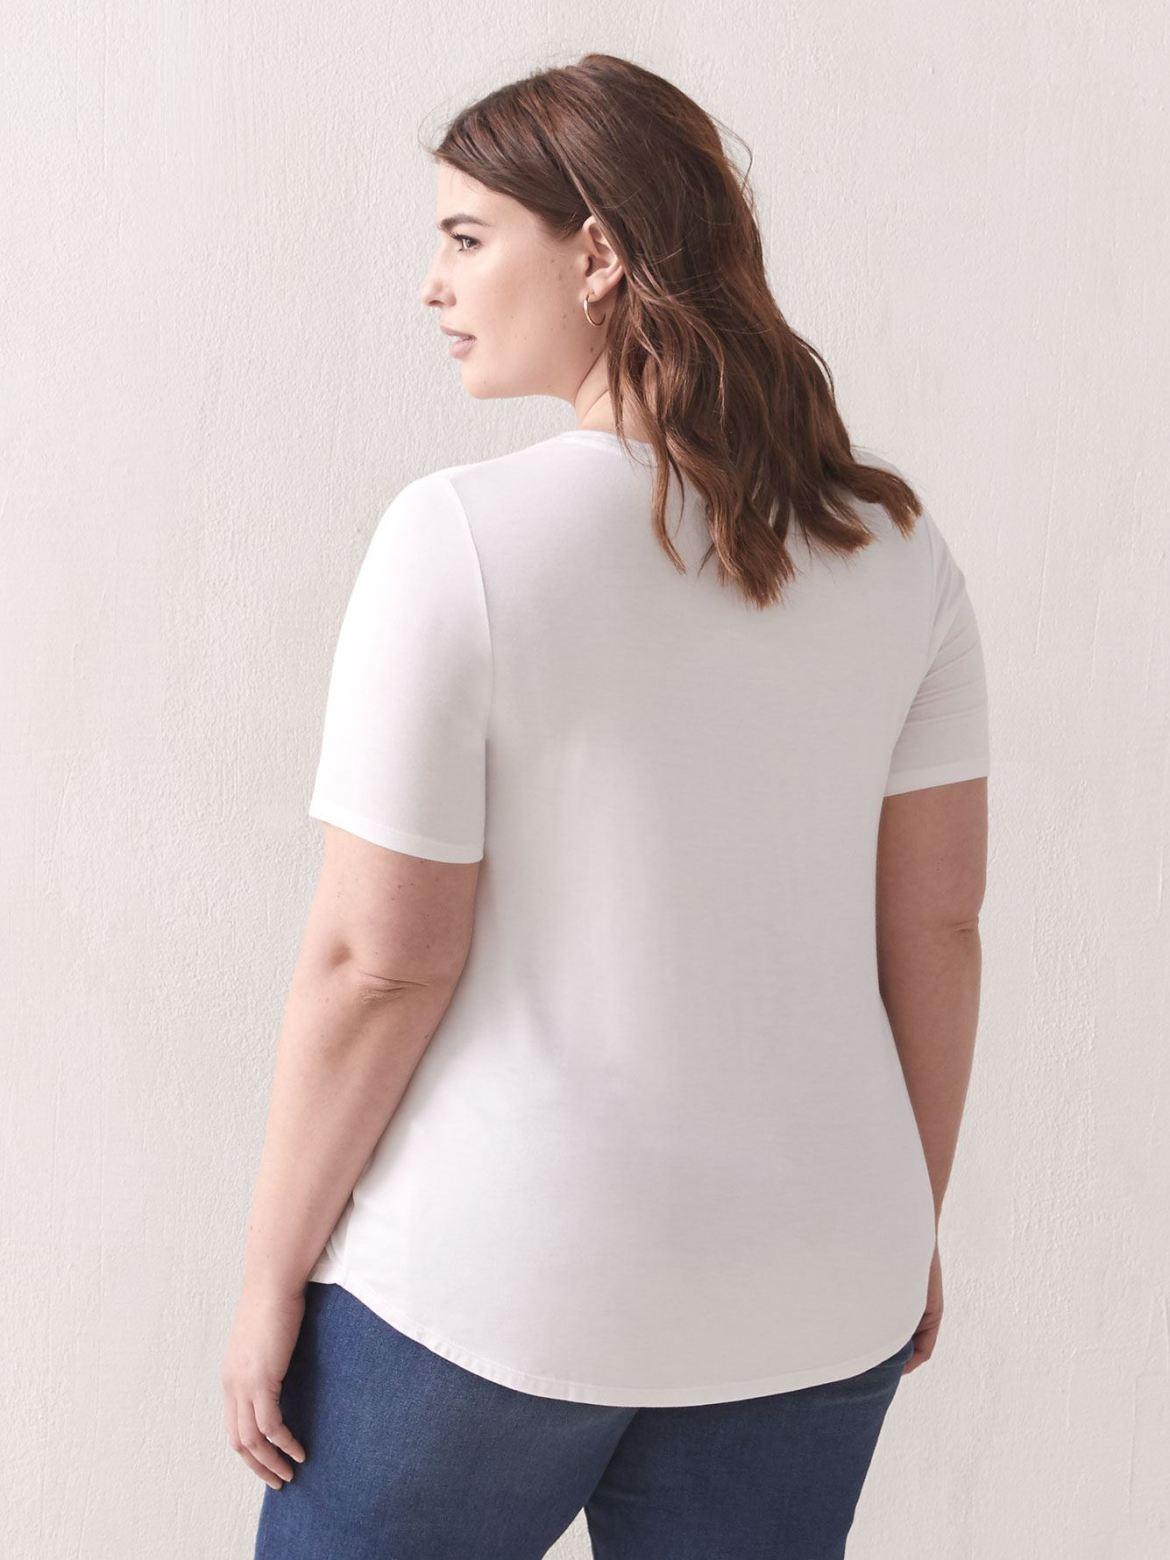 Modern-Fit Crew-Neck T-Shirt - Addition Elle